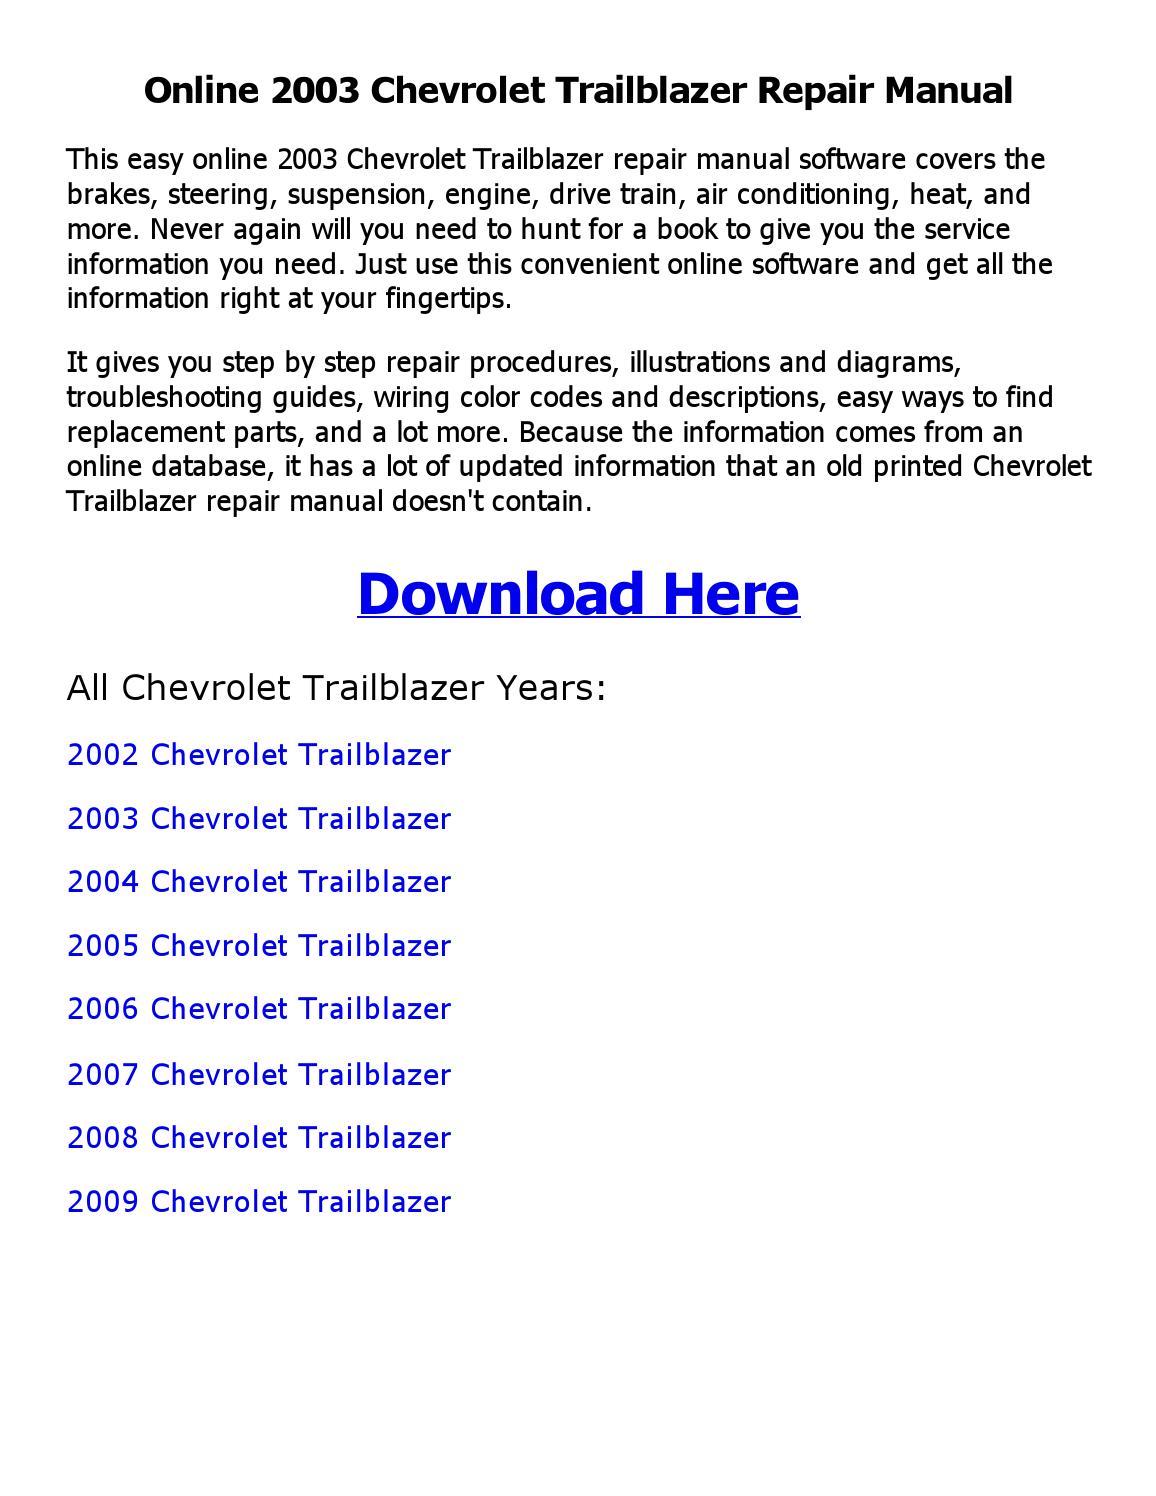 2002 Trailblazer Wiring Diagram 2003 Chevy Trailblazer Electrical